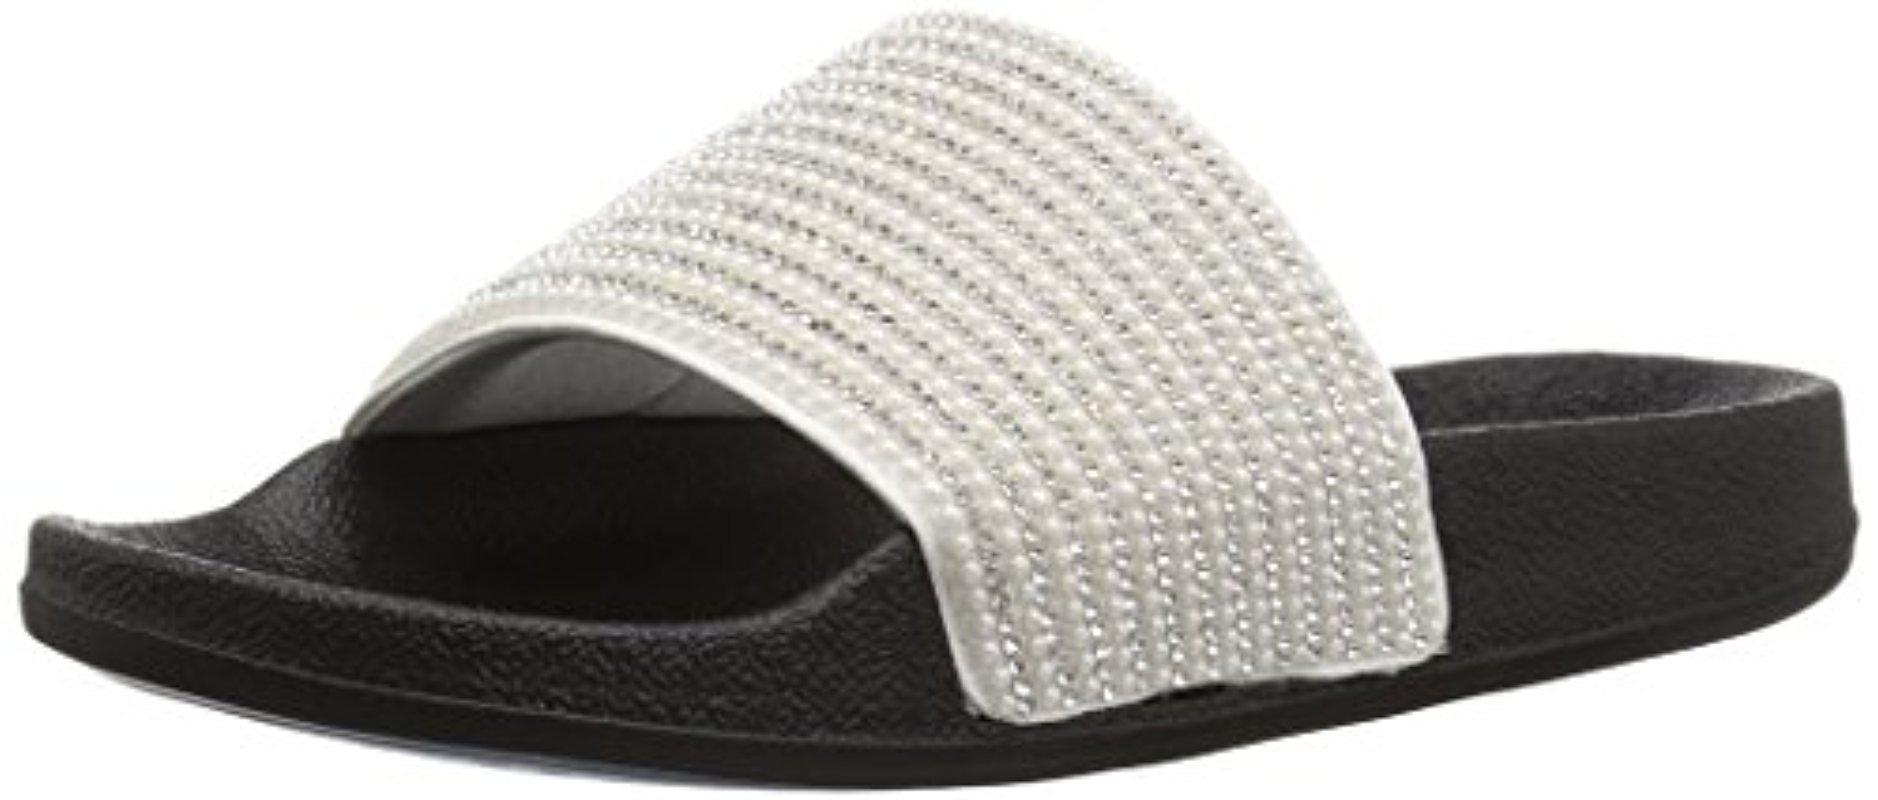 skechers rhinestone sandals